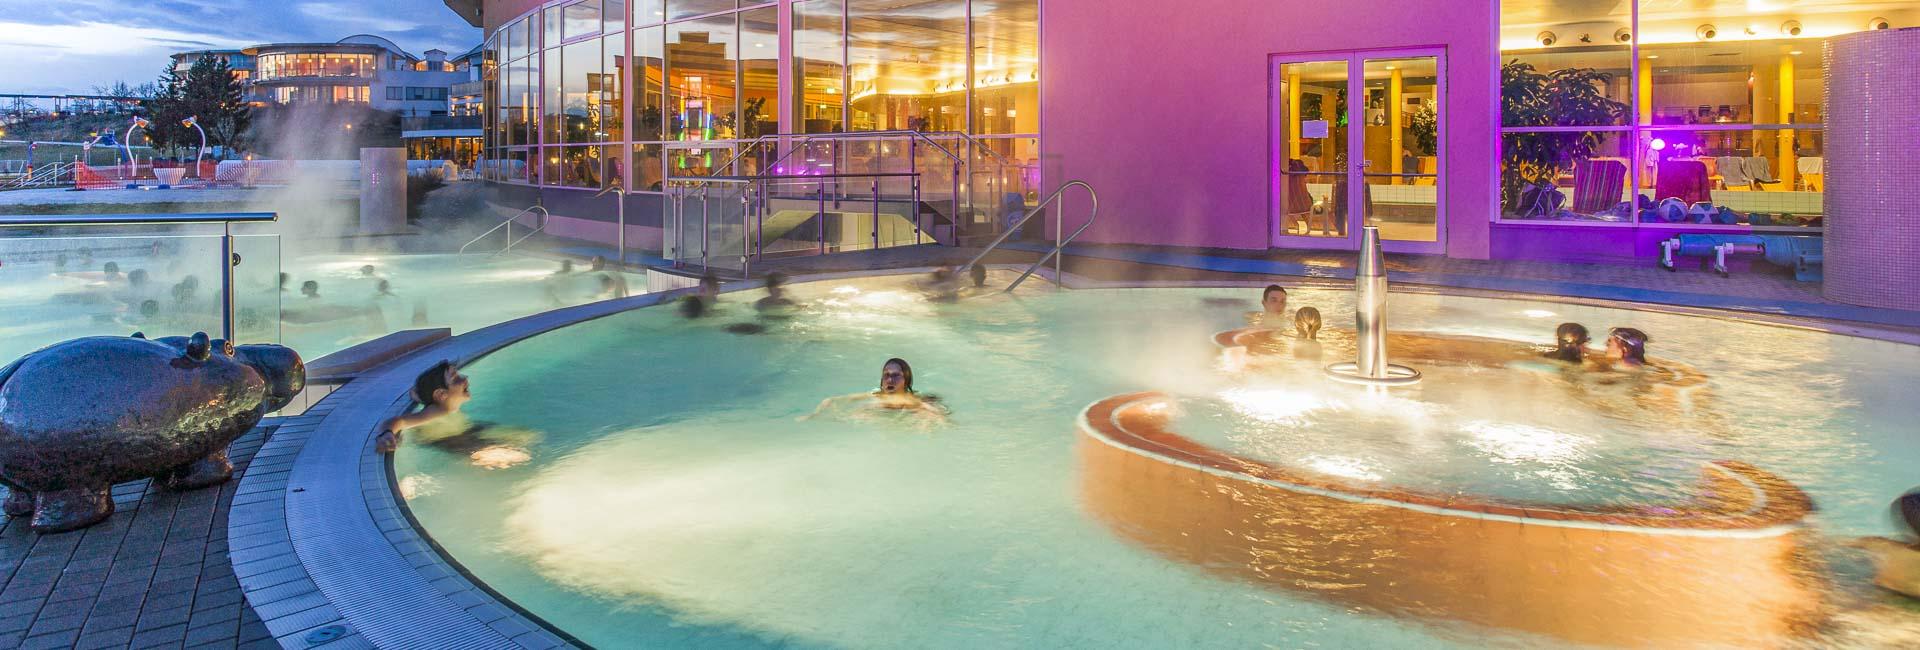 Reiters Resort Stegersbach: Thermalbad + Allegria Hotel